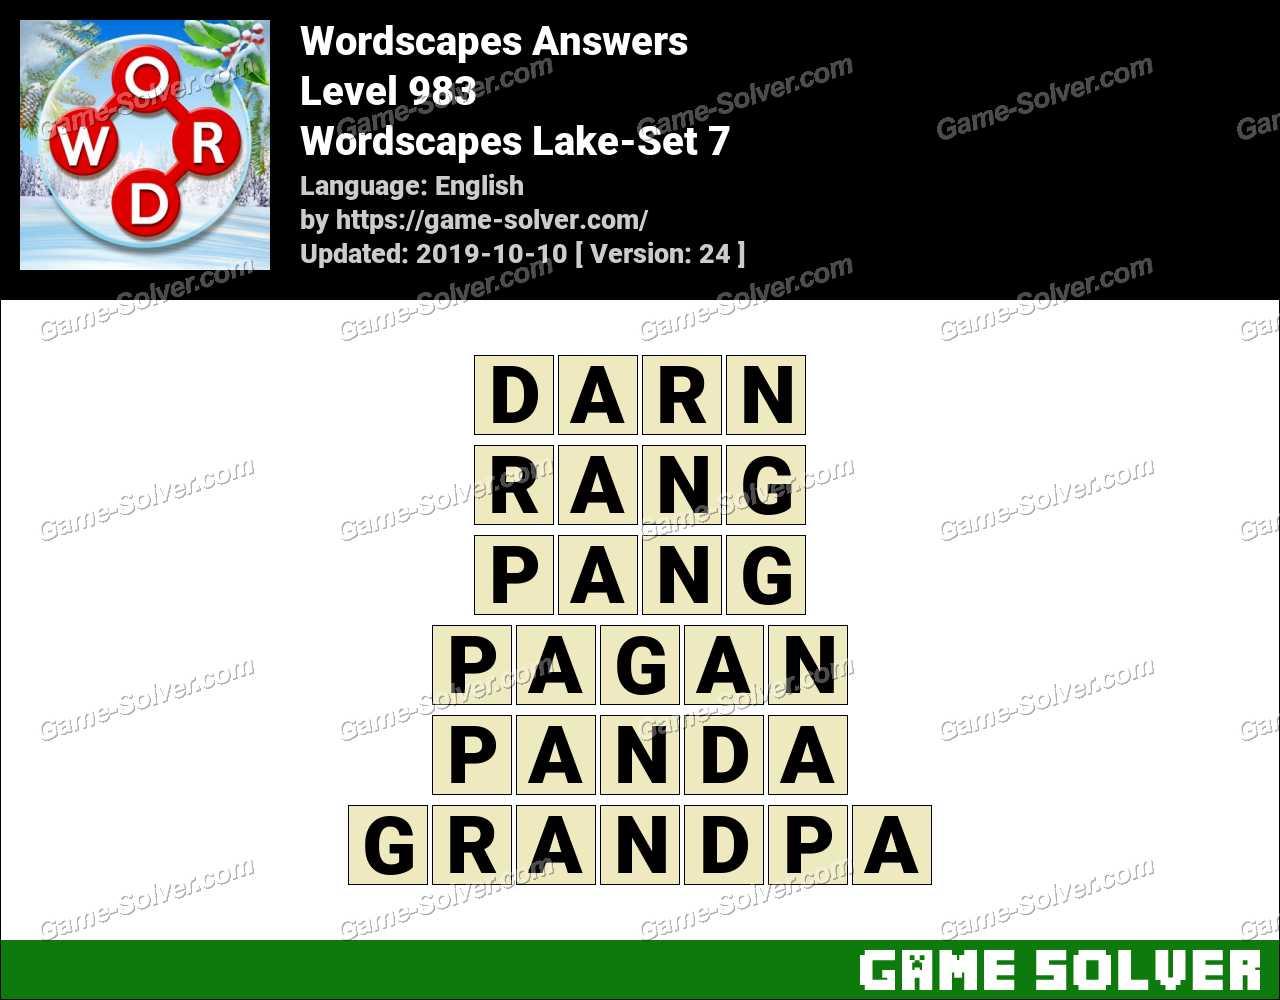 Wordscapes Lake-Set 7 Answers